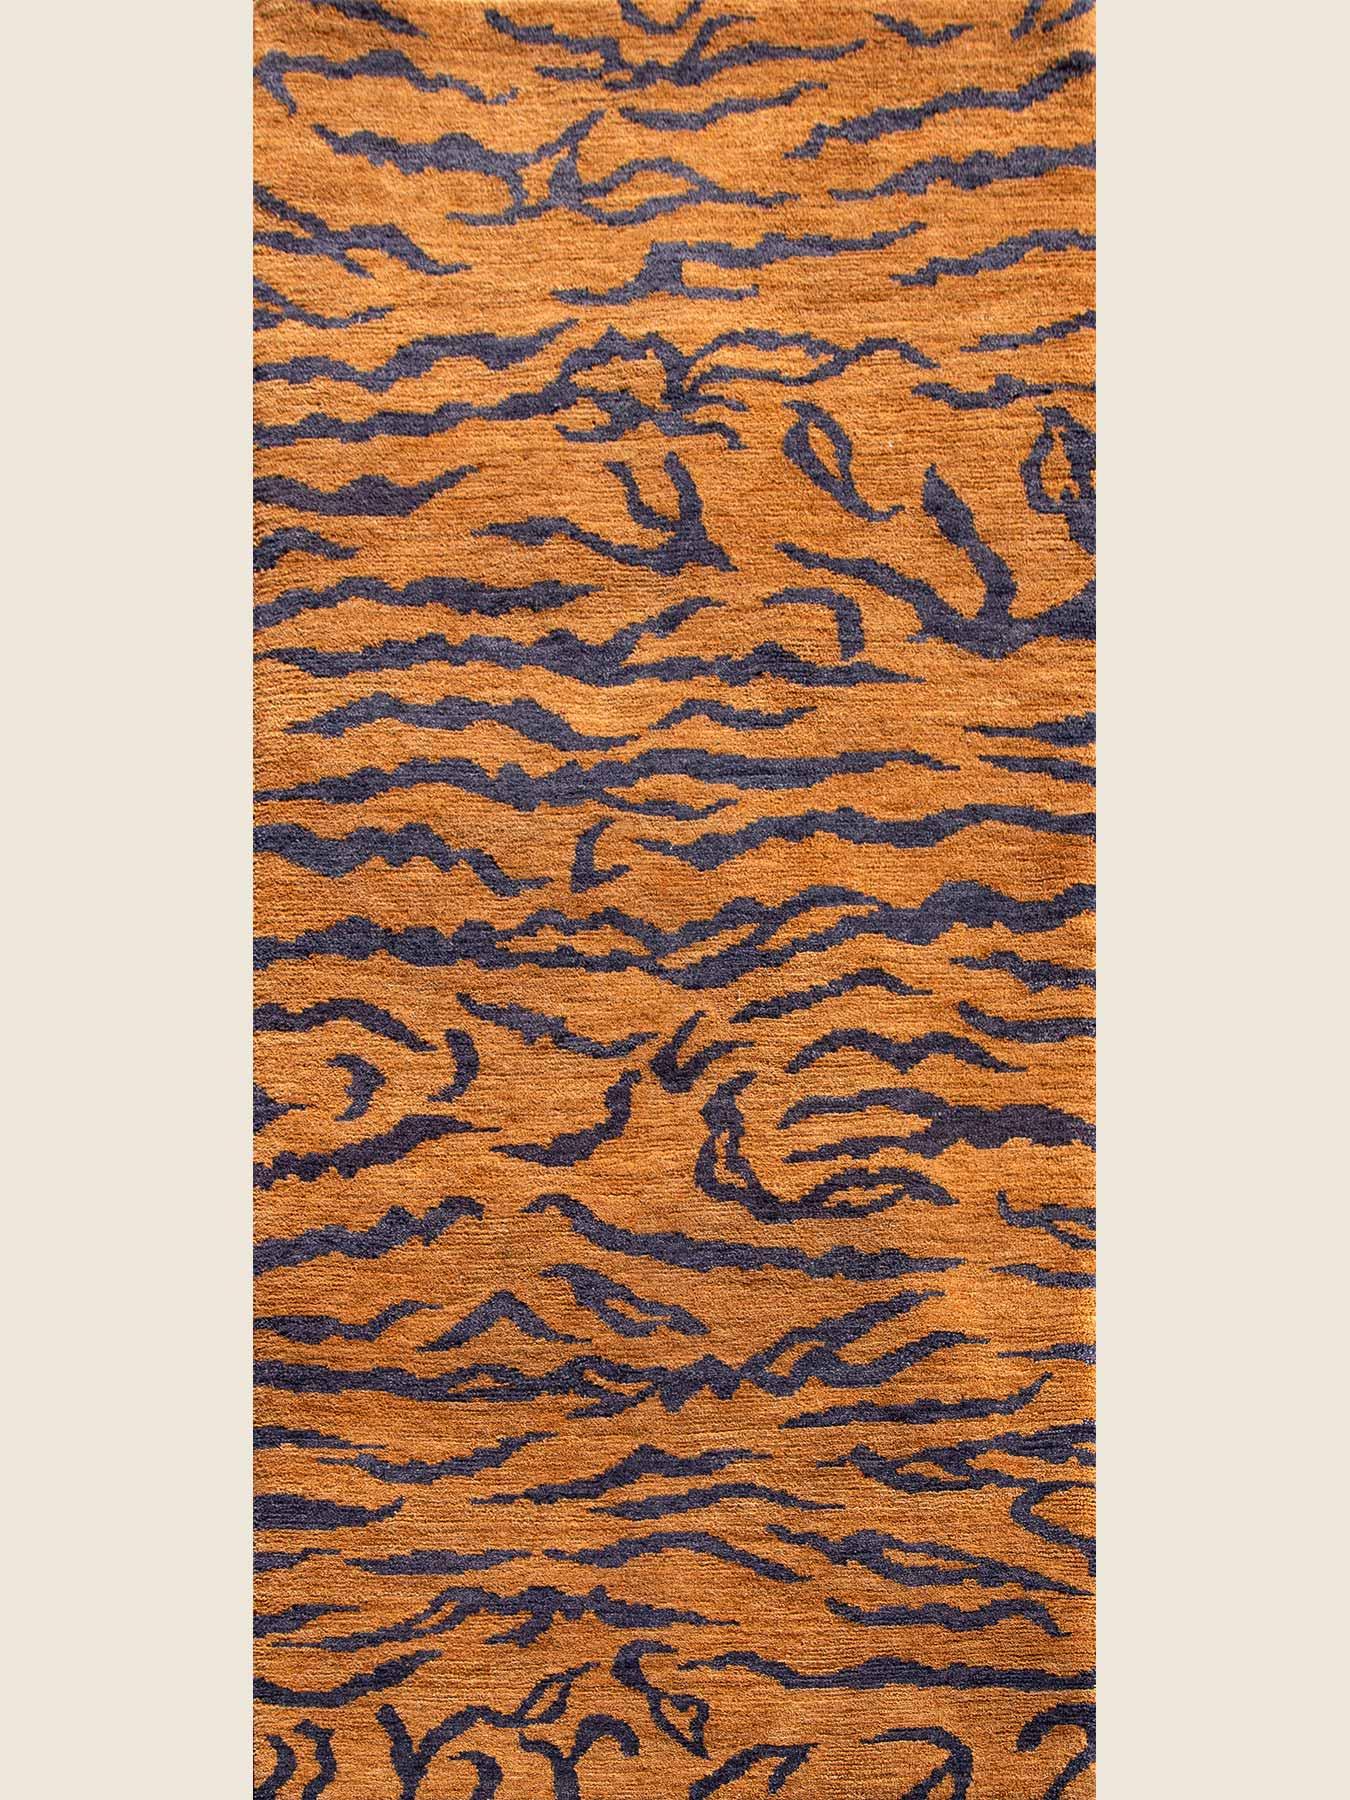 tiger skin pattern zt-03